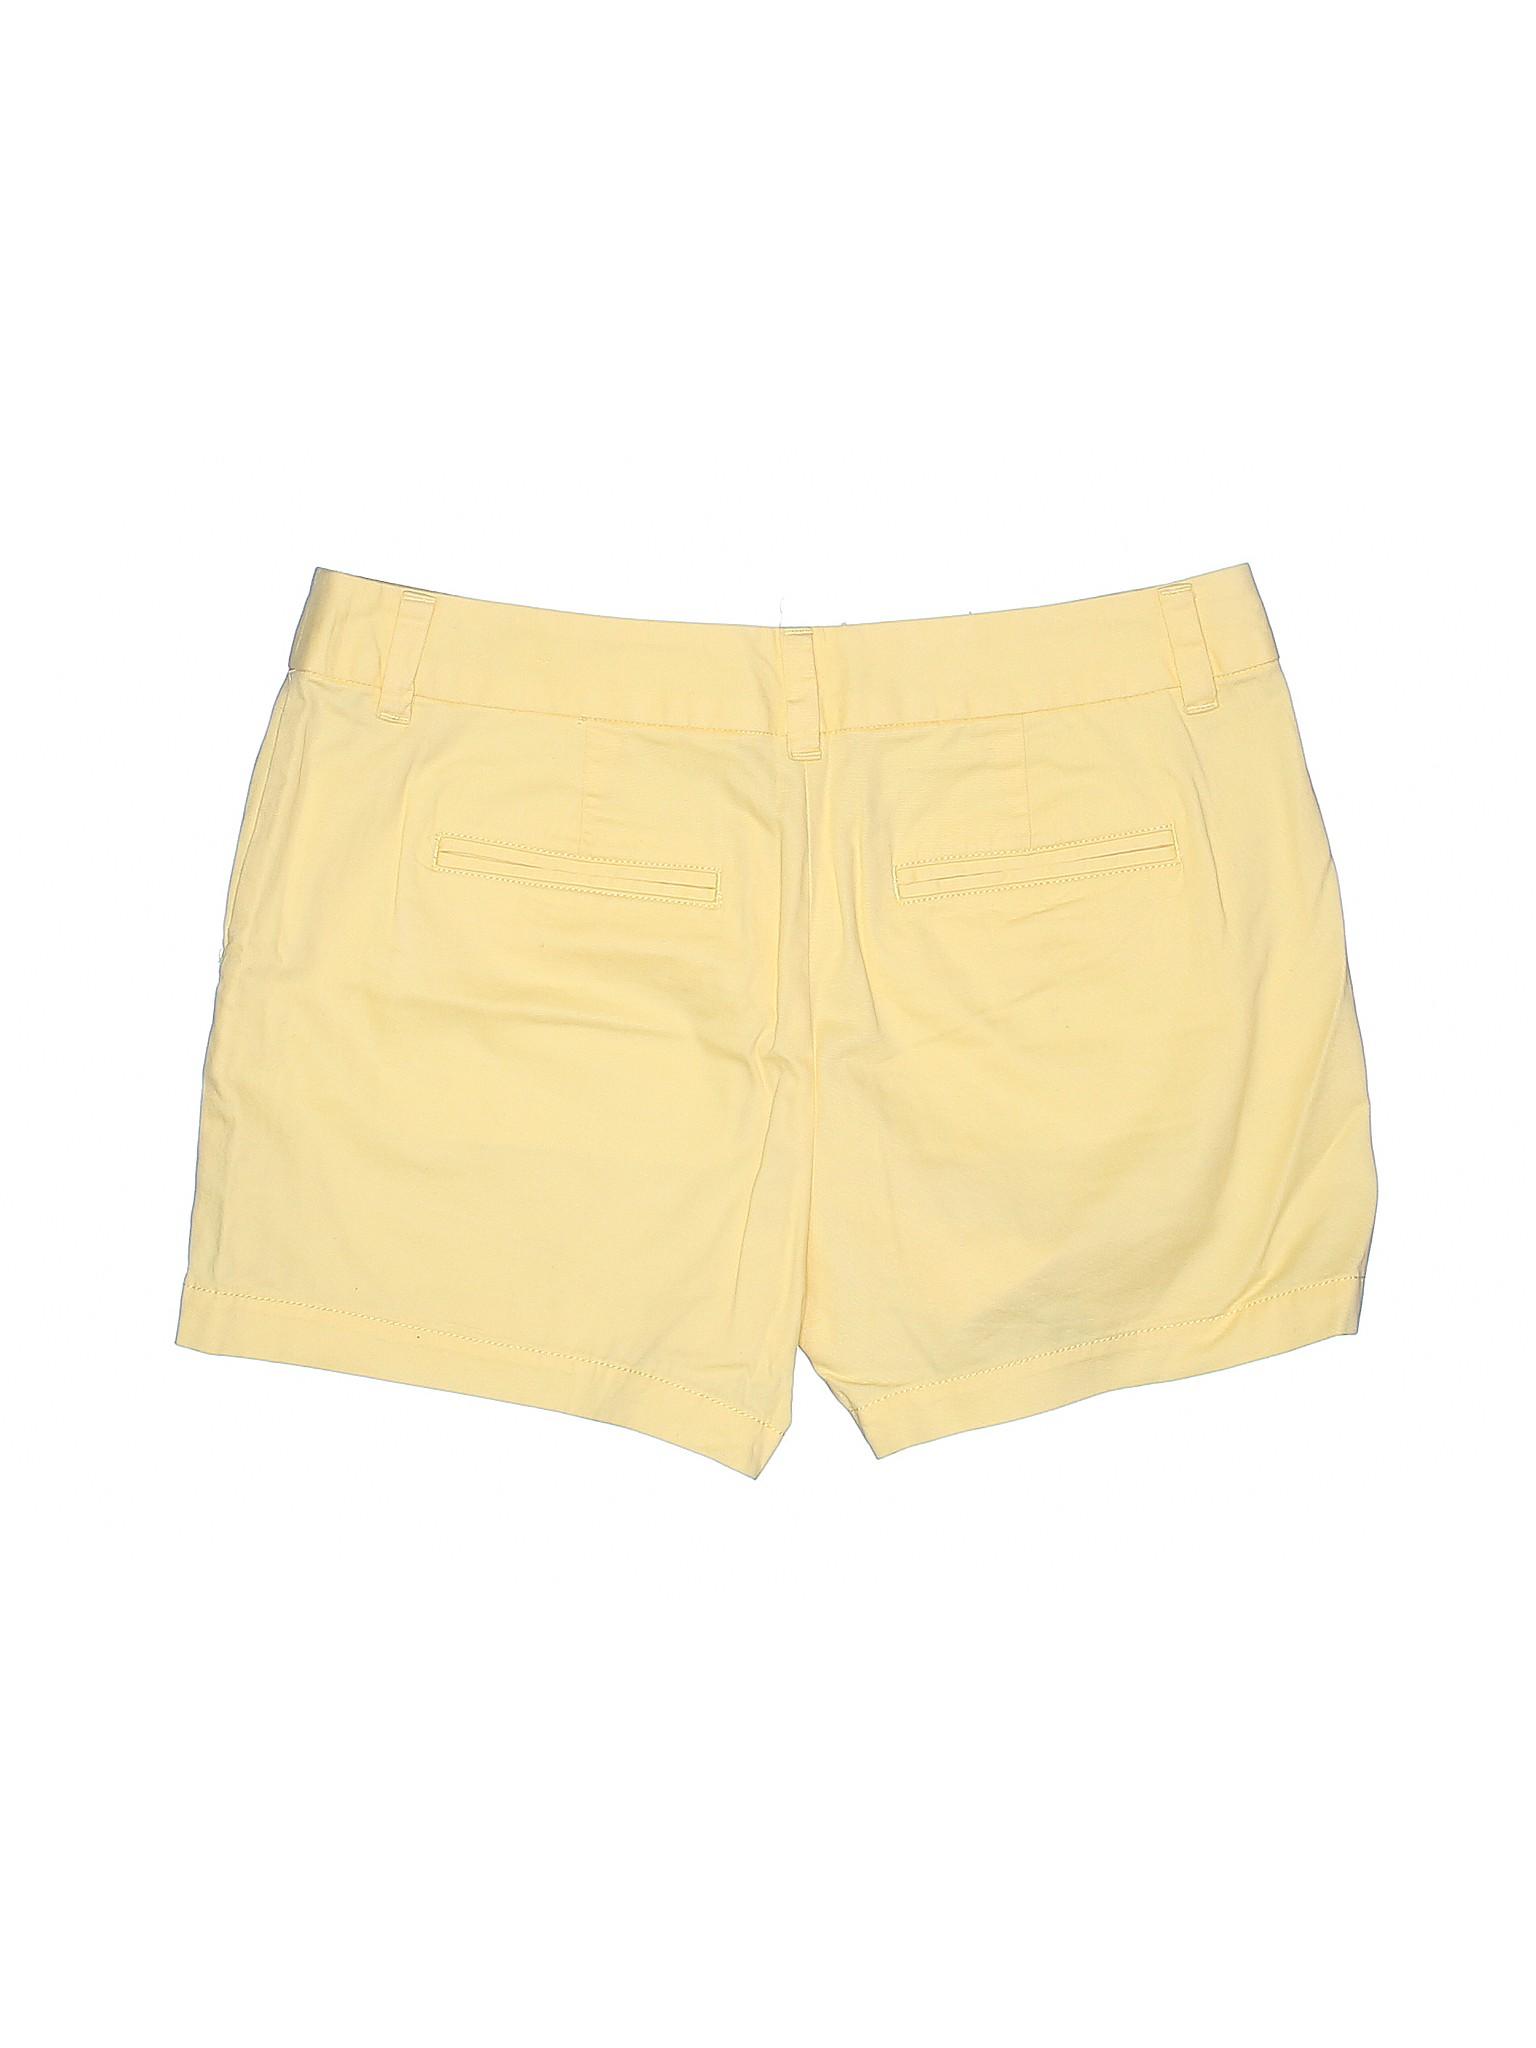 LOFT leisure Ann Cargo Taylor Shorts Boutique wYq8xUtY